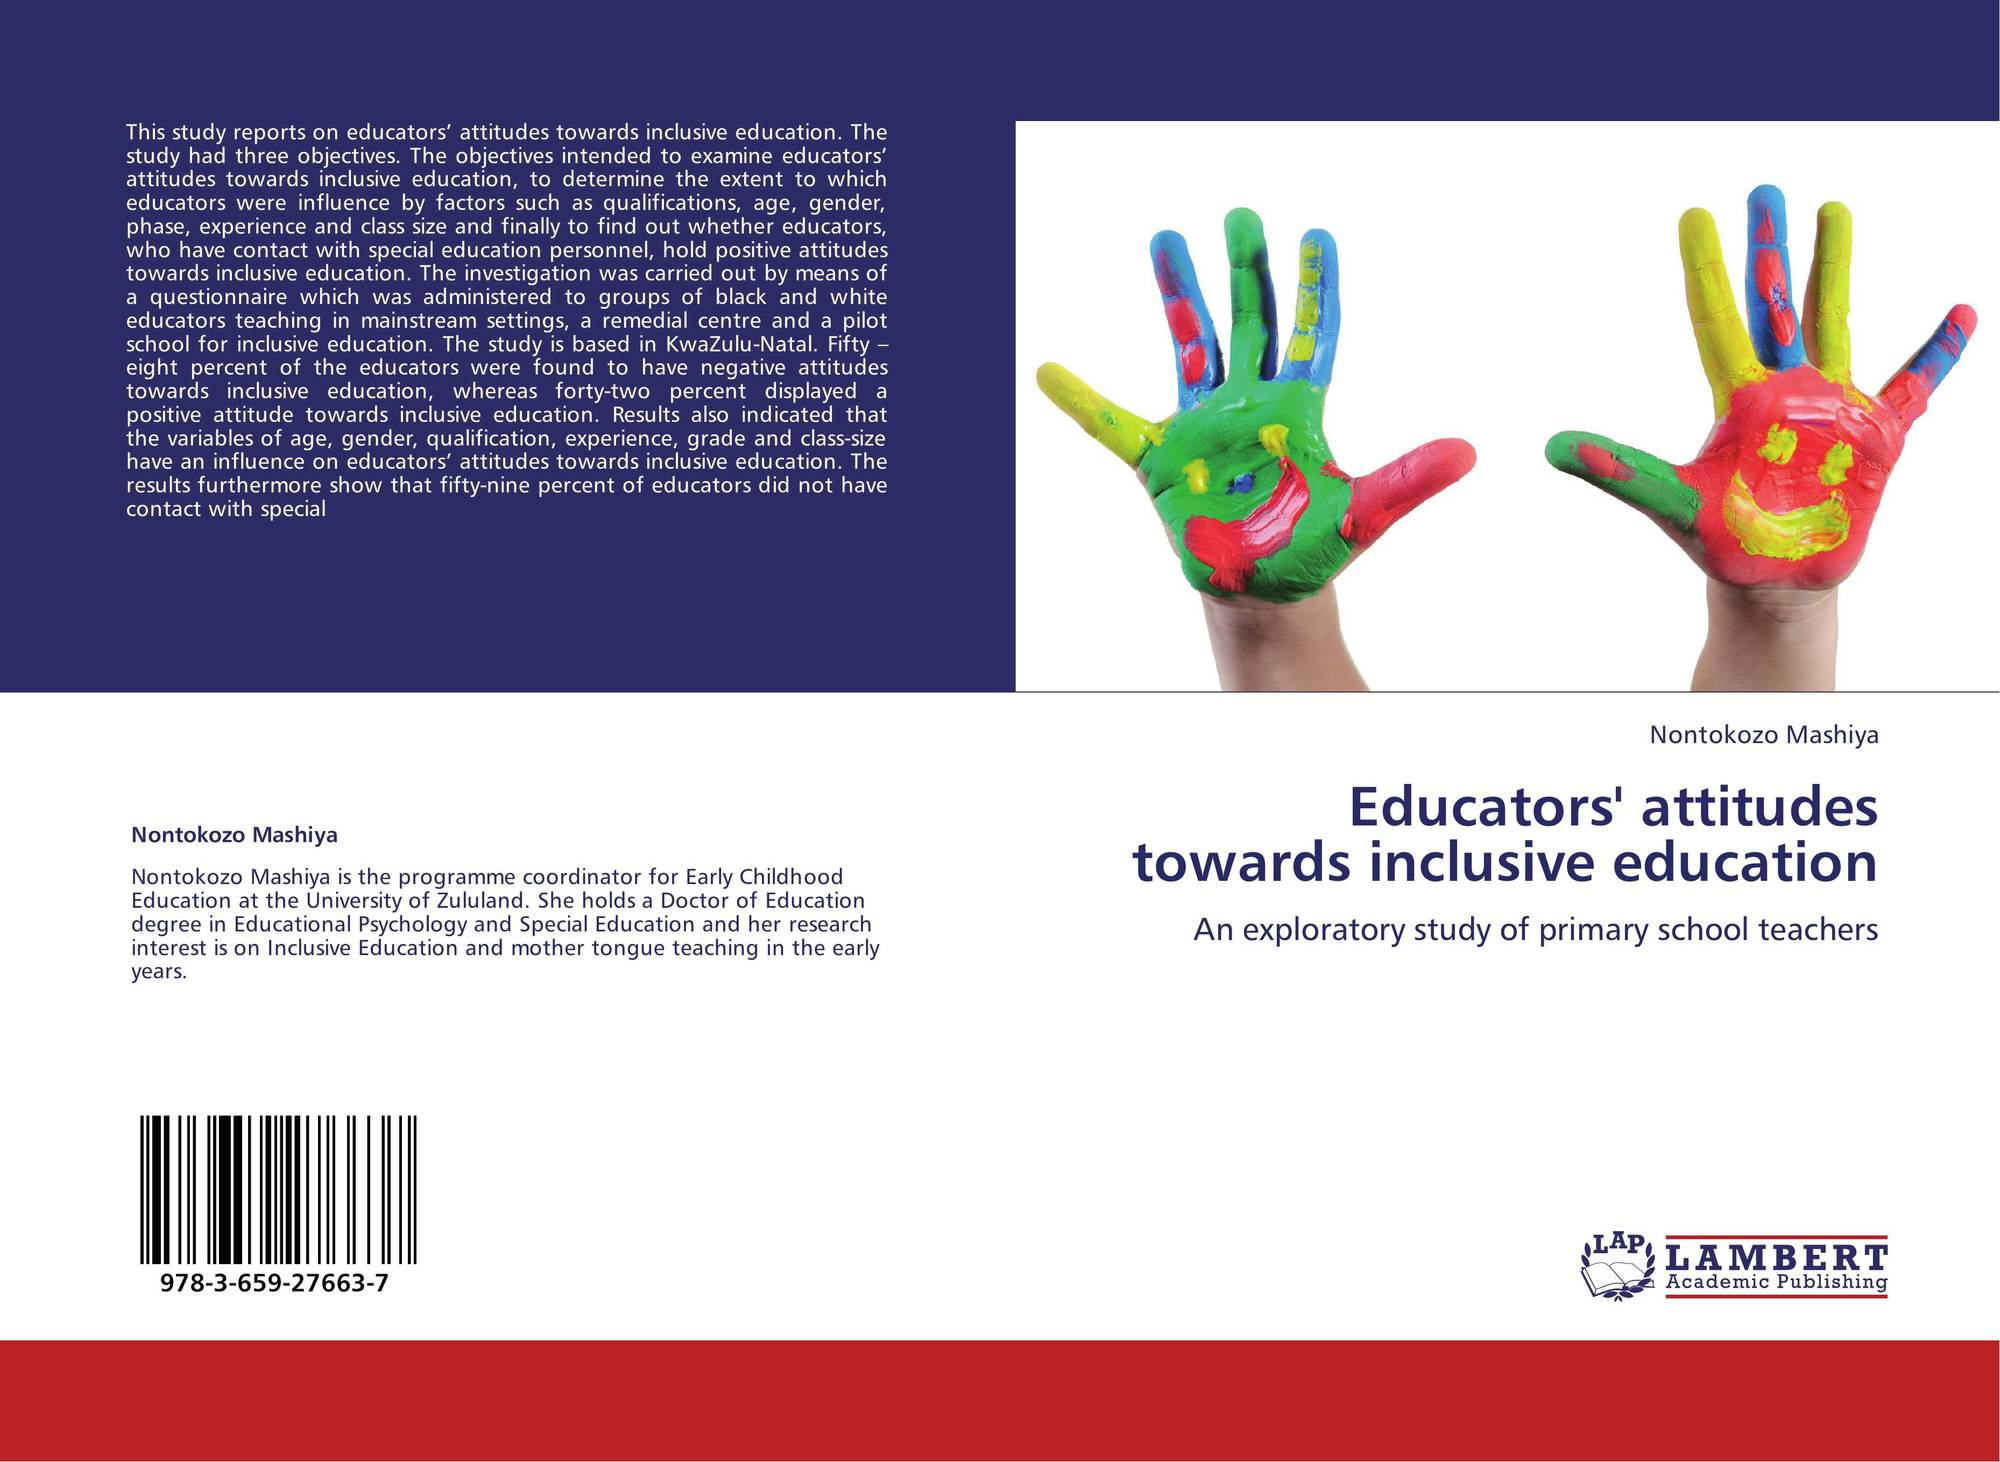 elementary school teachers' attitude towards inclusive